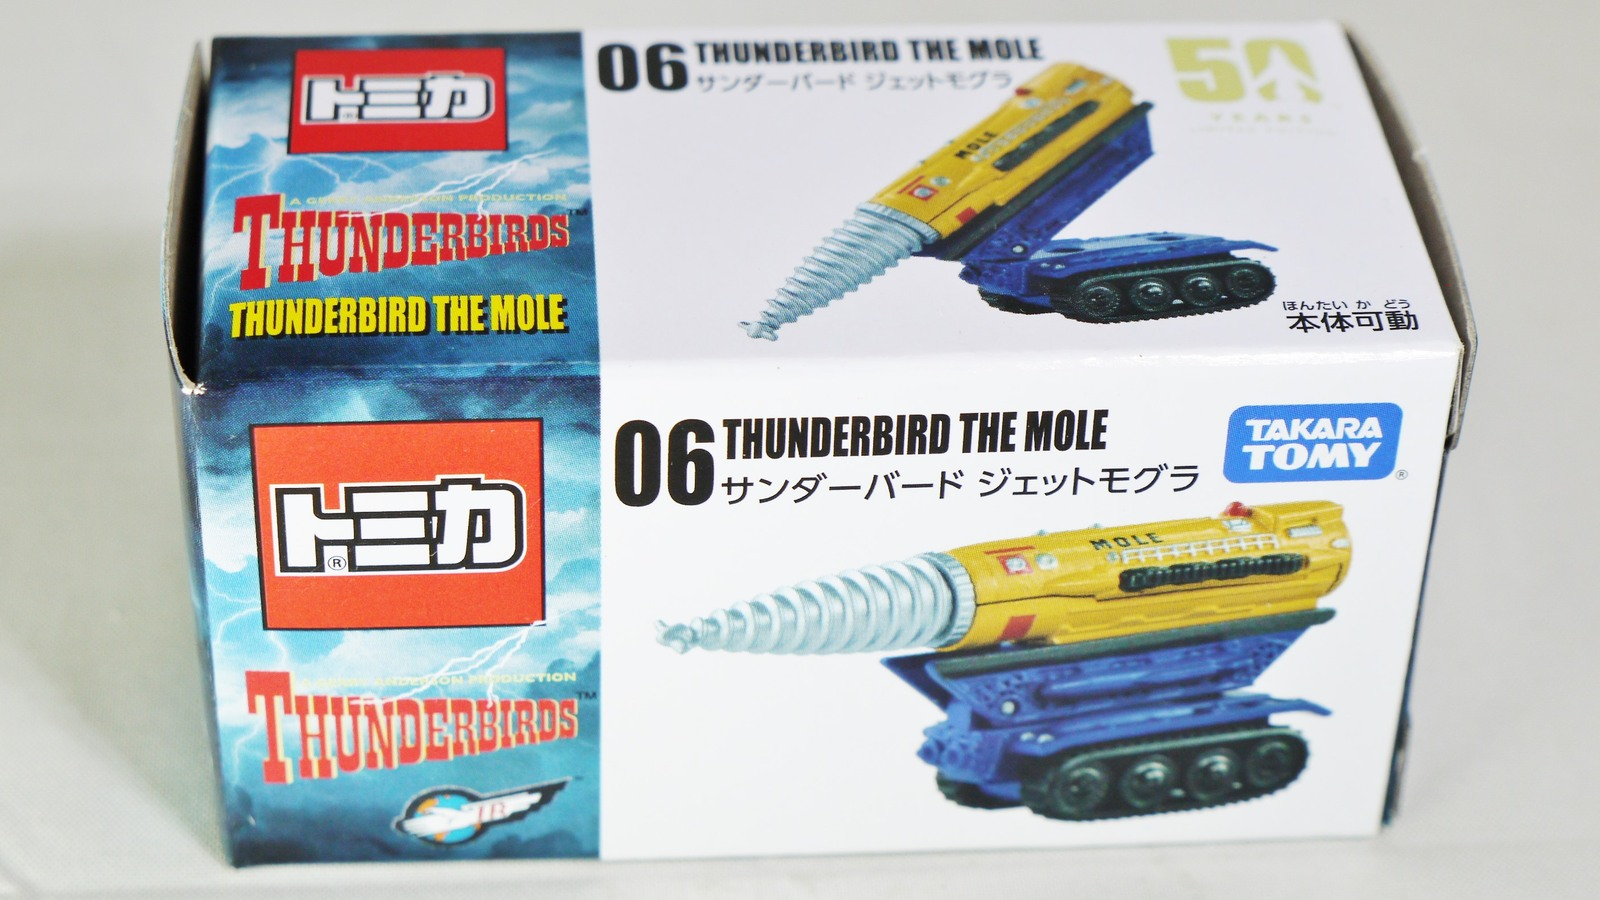 TAKARA TOMY TOMICA CLASSIC THUNDERBIRDS 50th Years Edition 06 THE MOLE